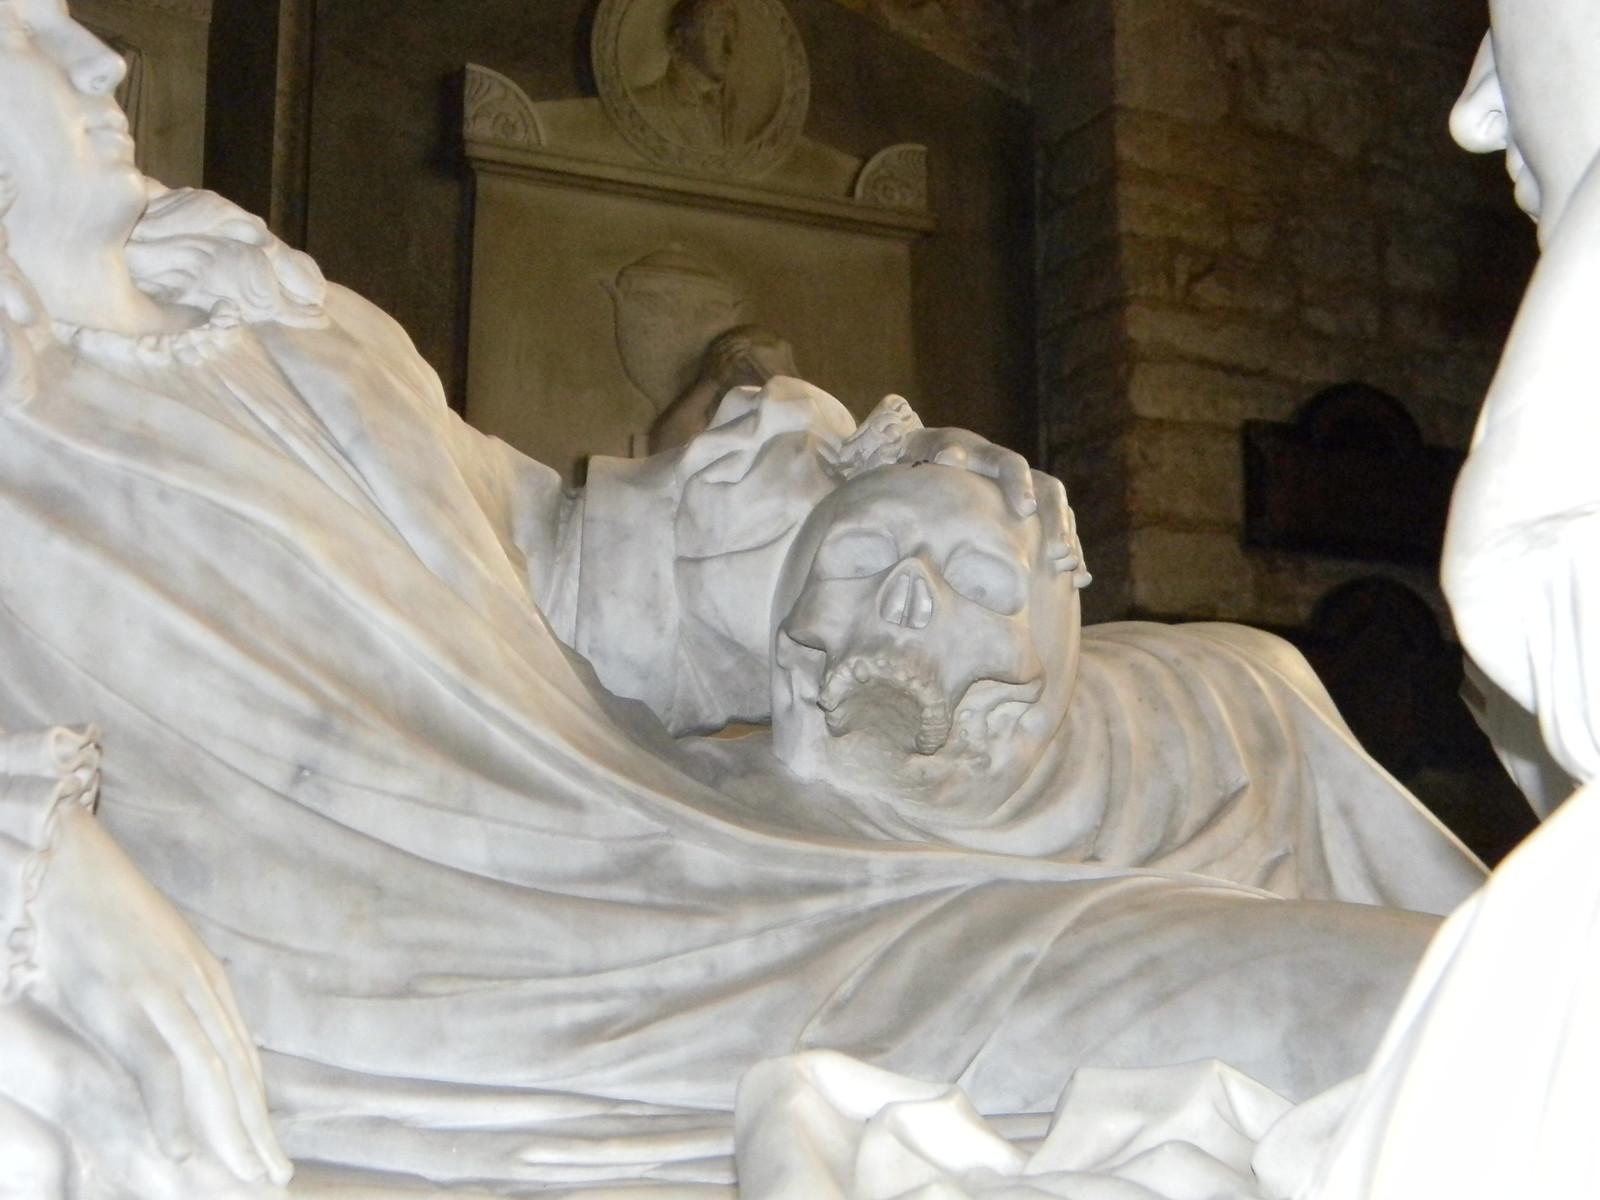 Detail, Sackville tomb, Withyam Church Ashurst Circular